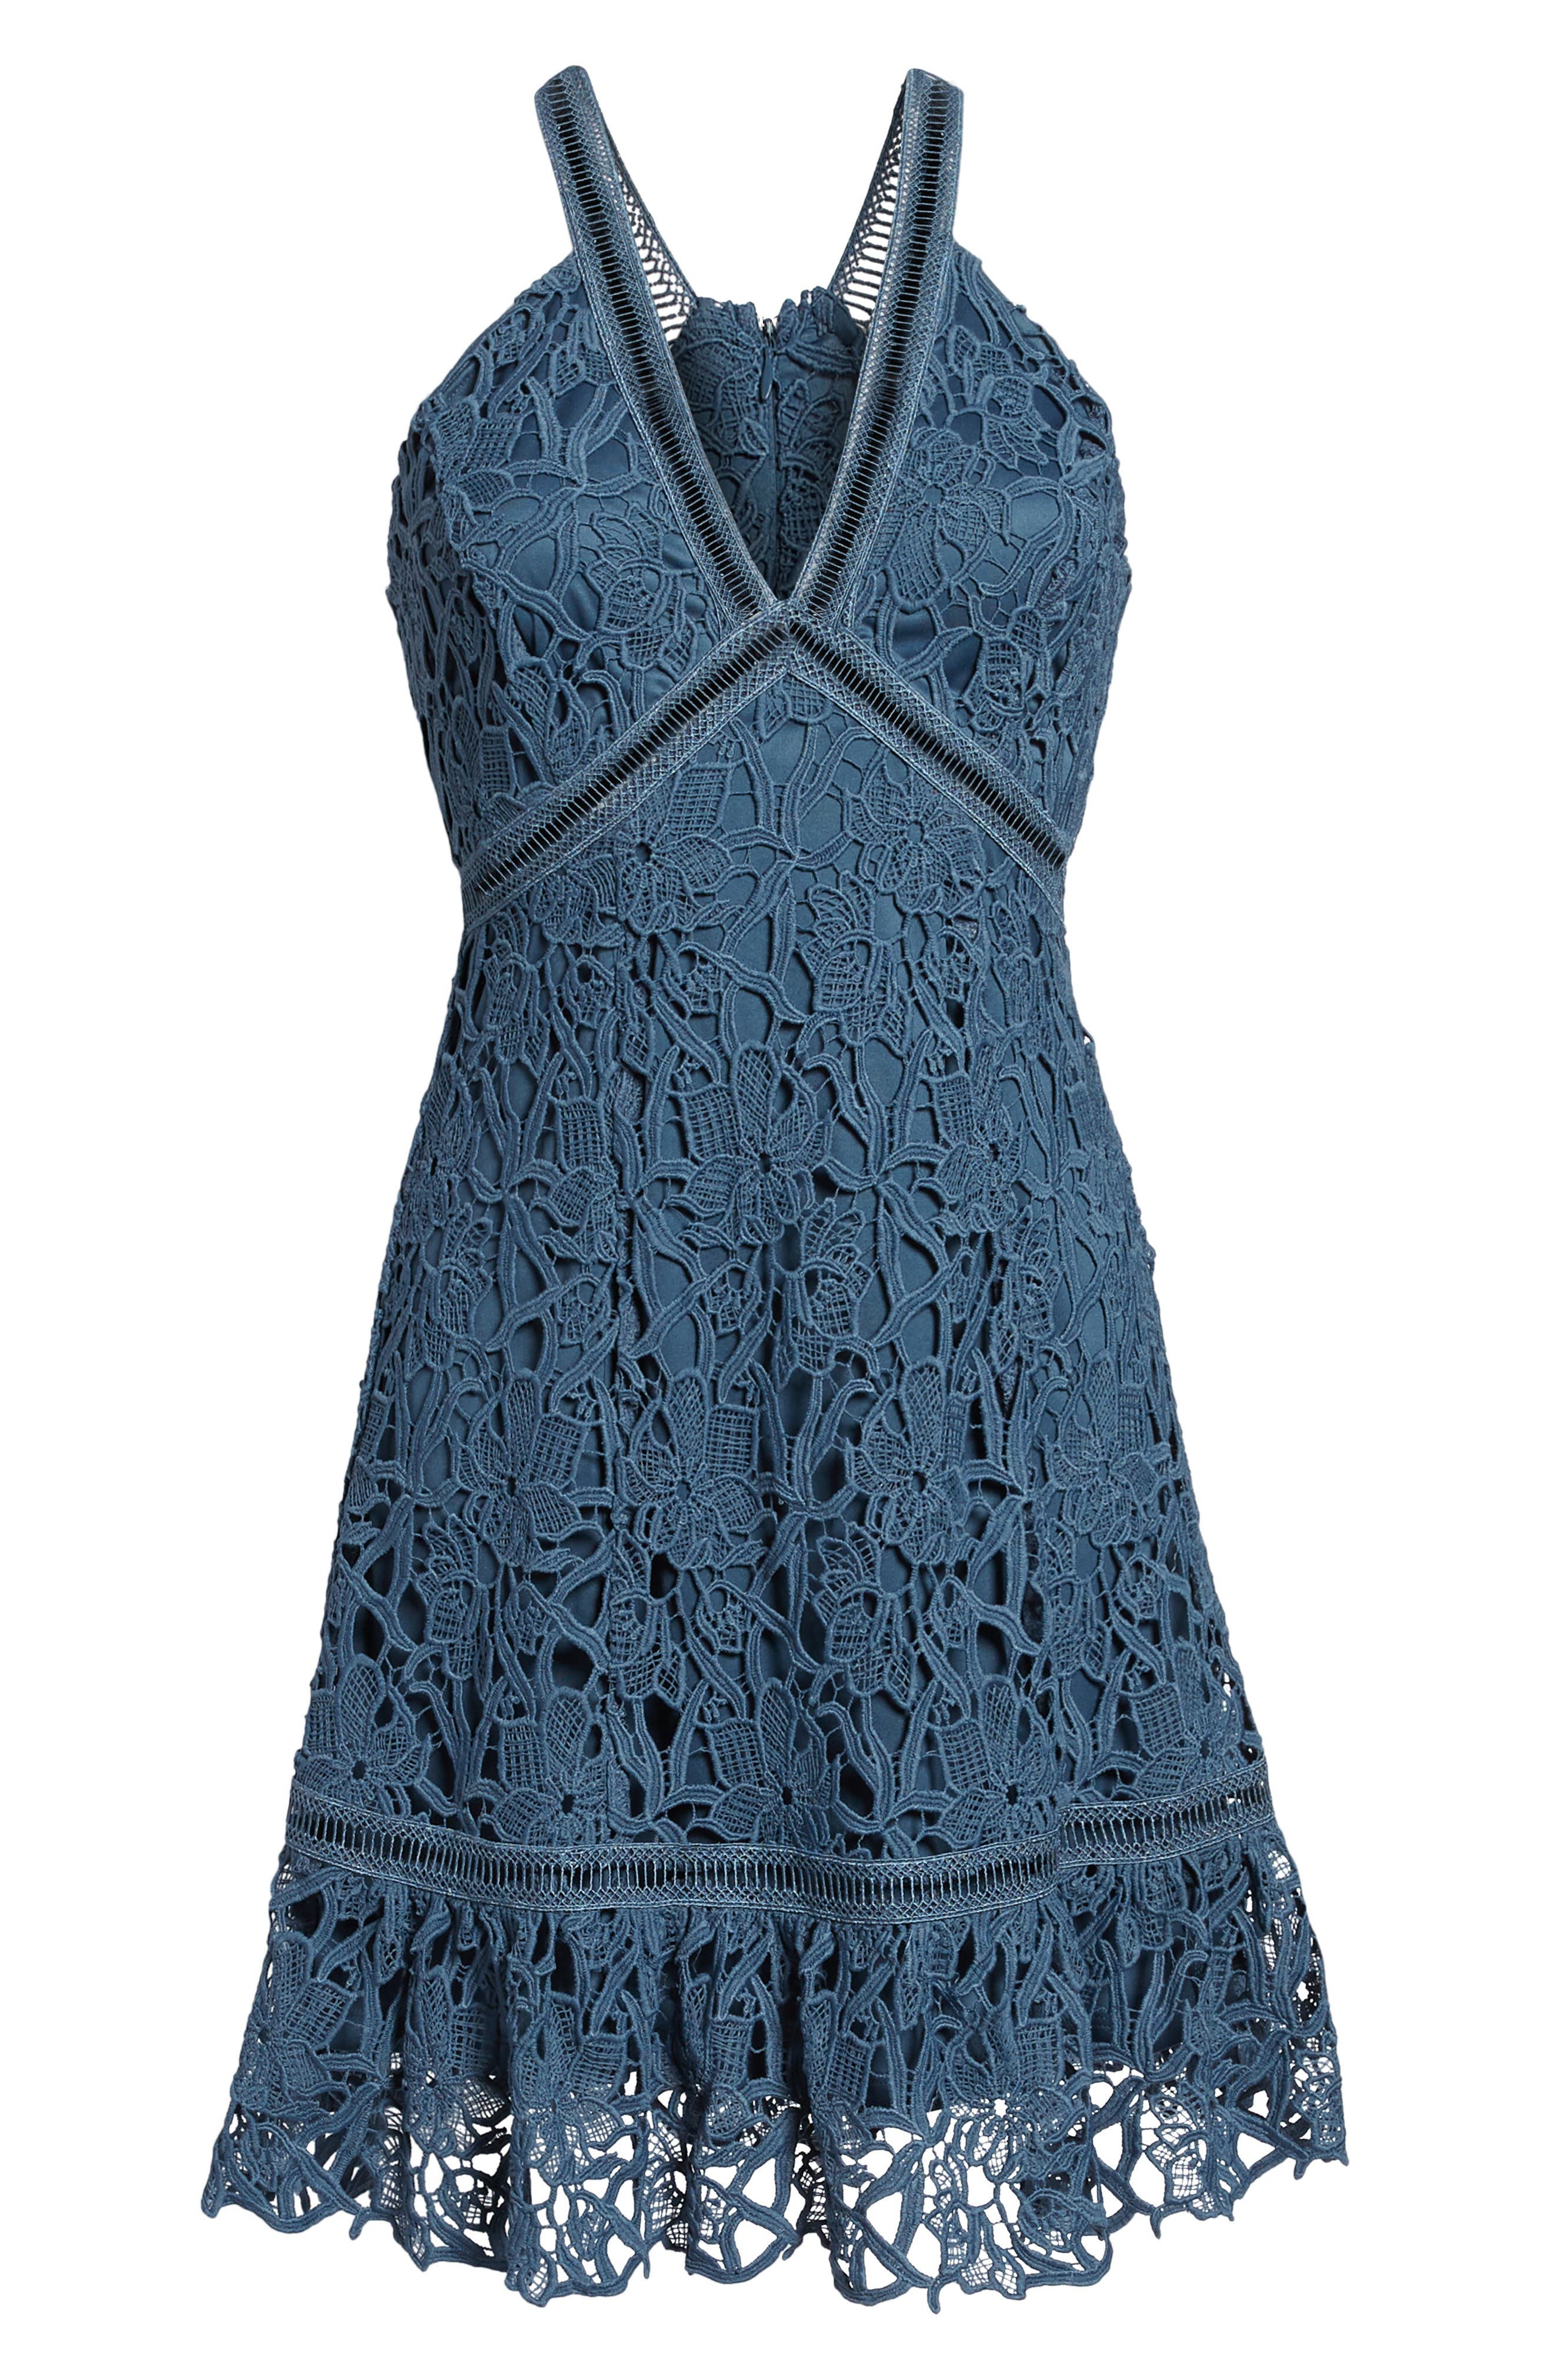 Ruffle Hem Lace Dress,                             Alternate thumbnail 6, color,                             Dusty Teal